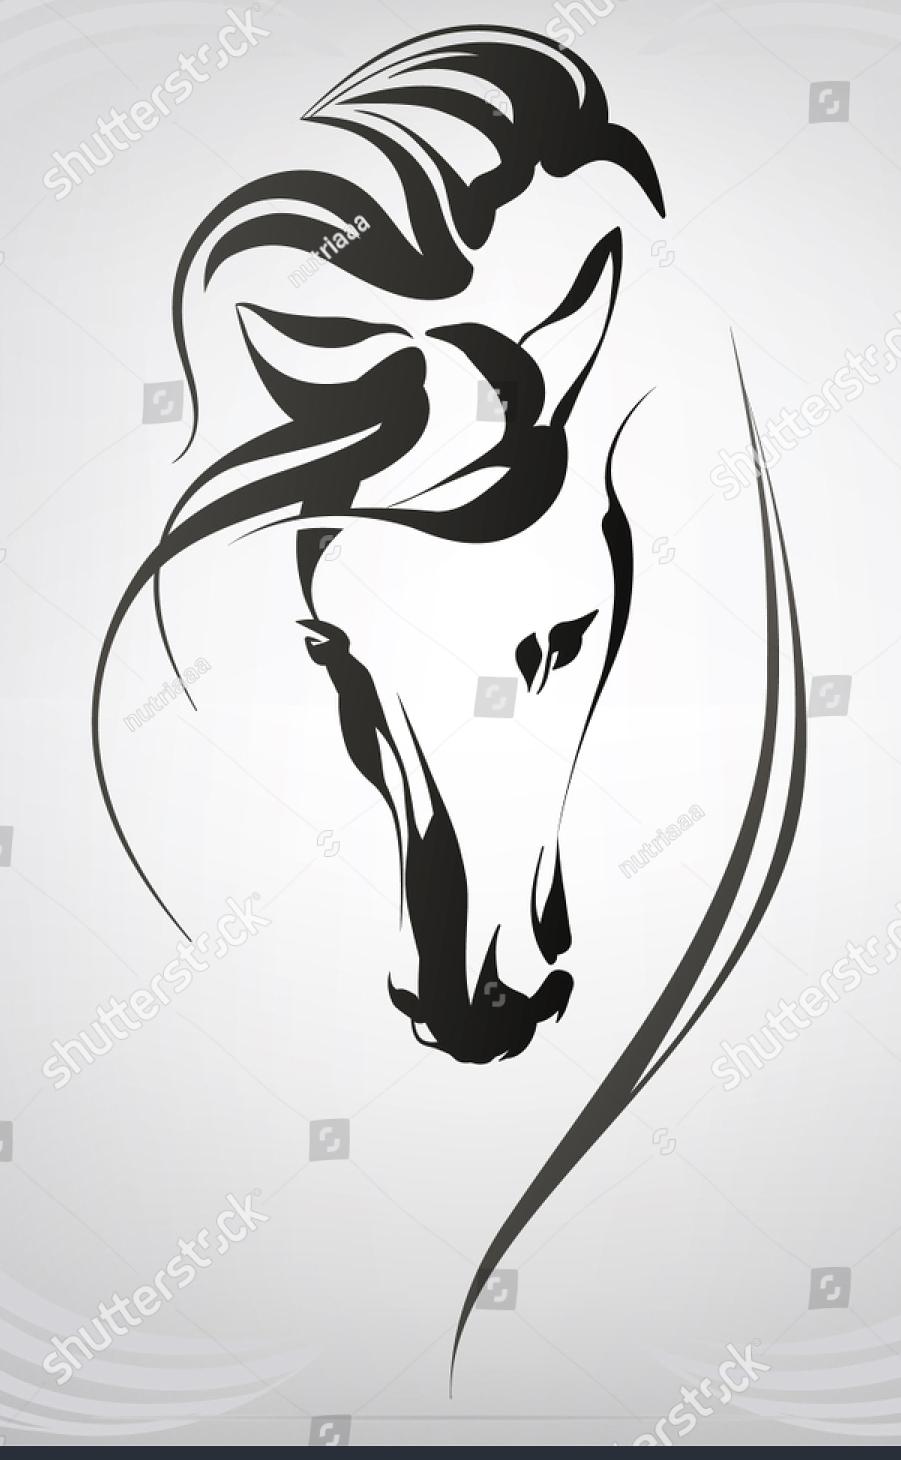 Mar~Li Equestrian image